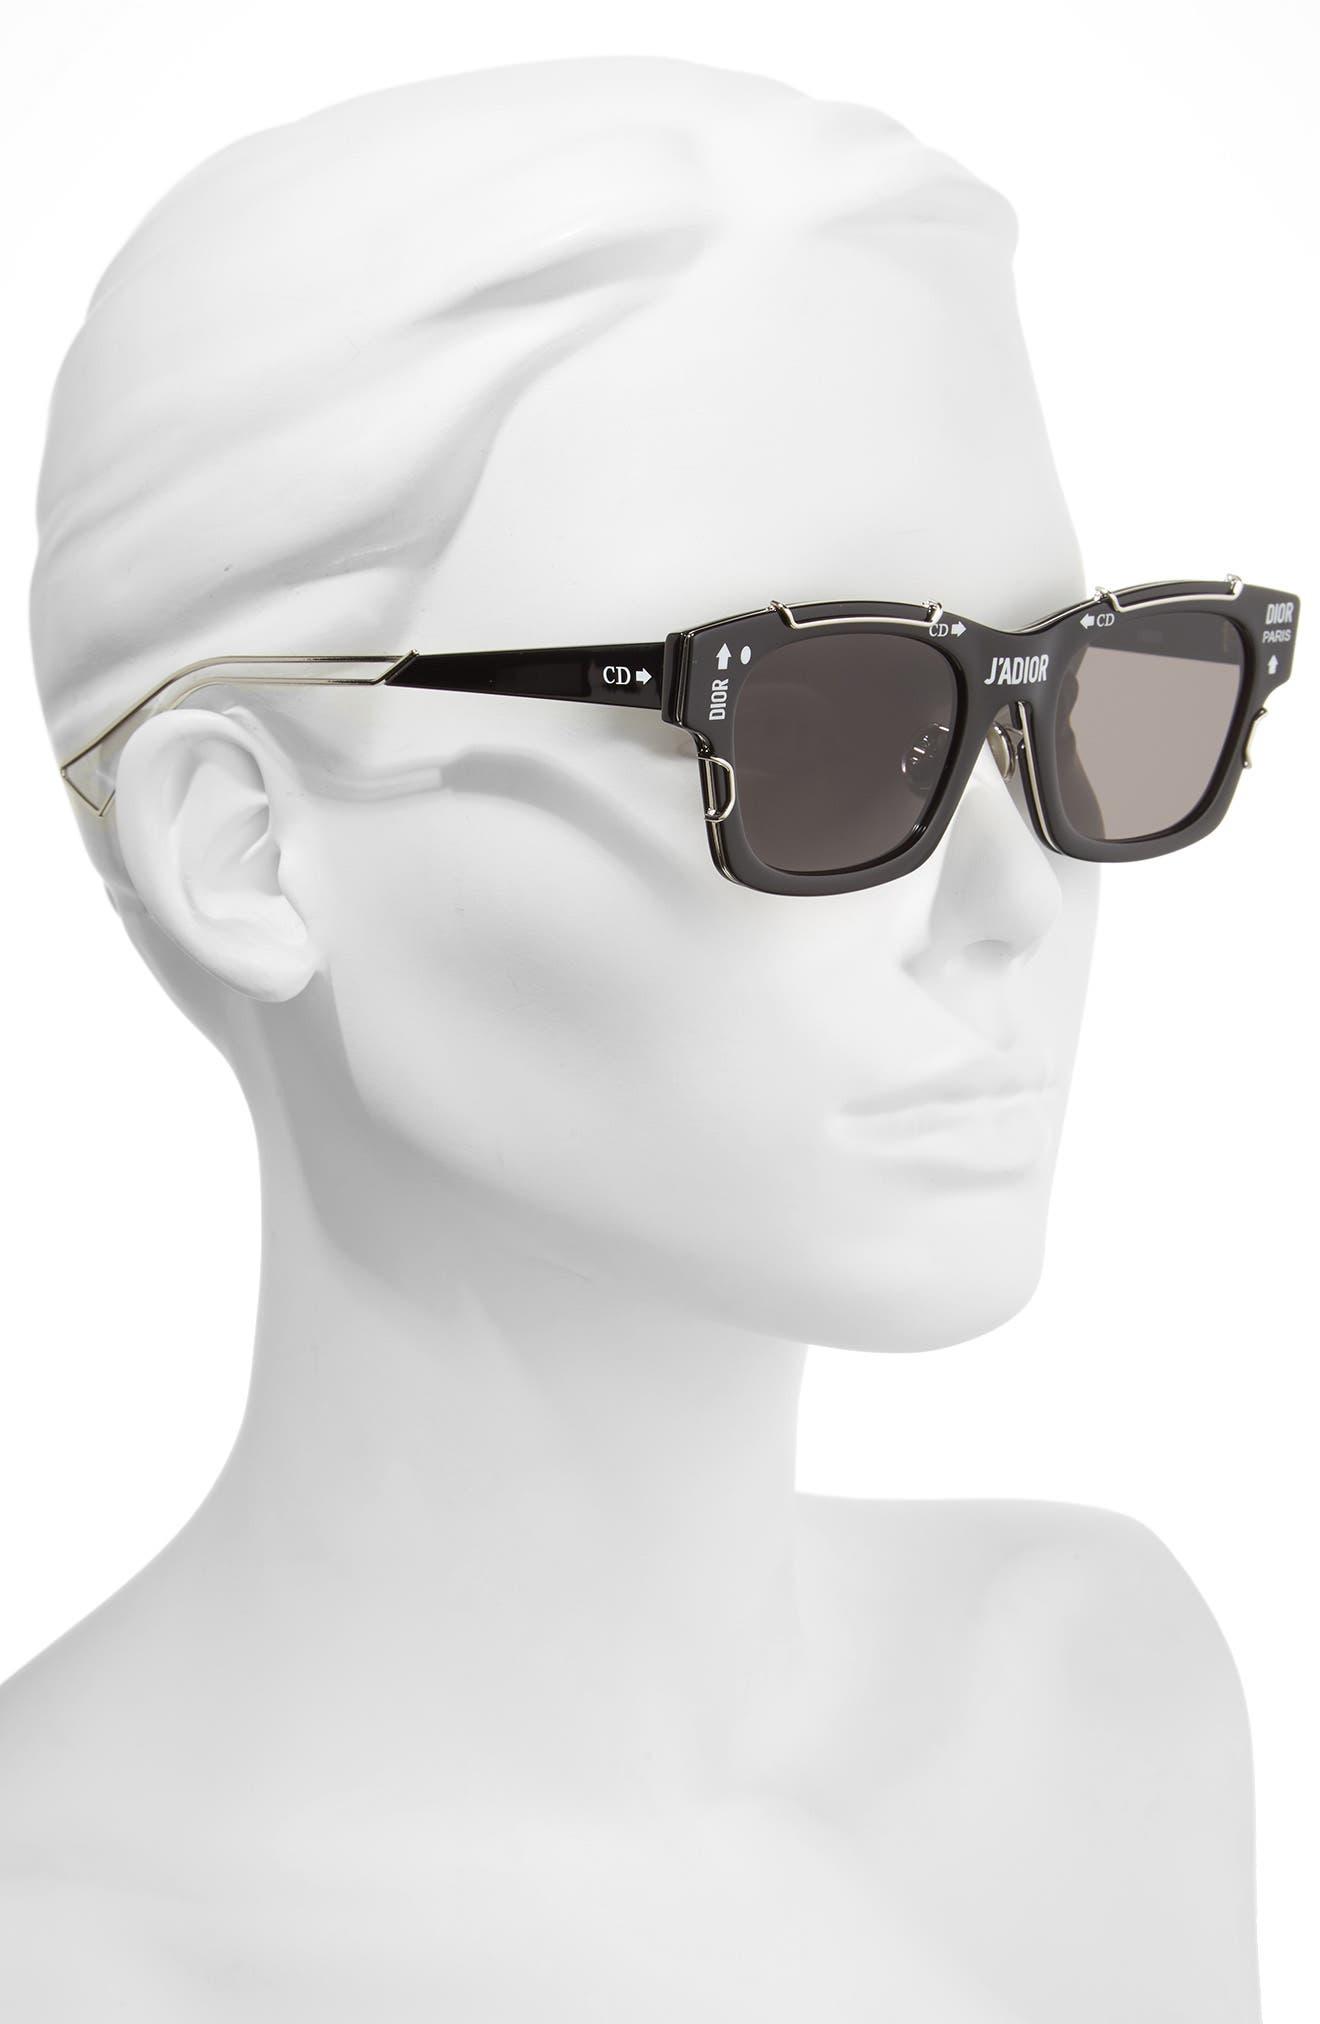 DIOR,                             J'Adior 51mm Sunglasses,                             Alternate thumbnail 2, color,                             001